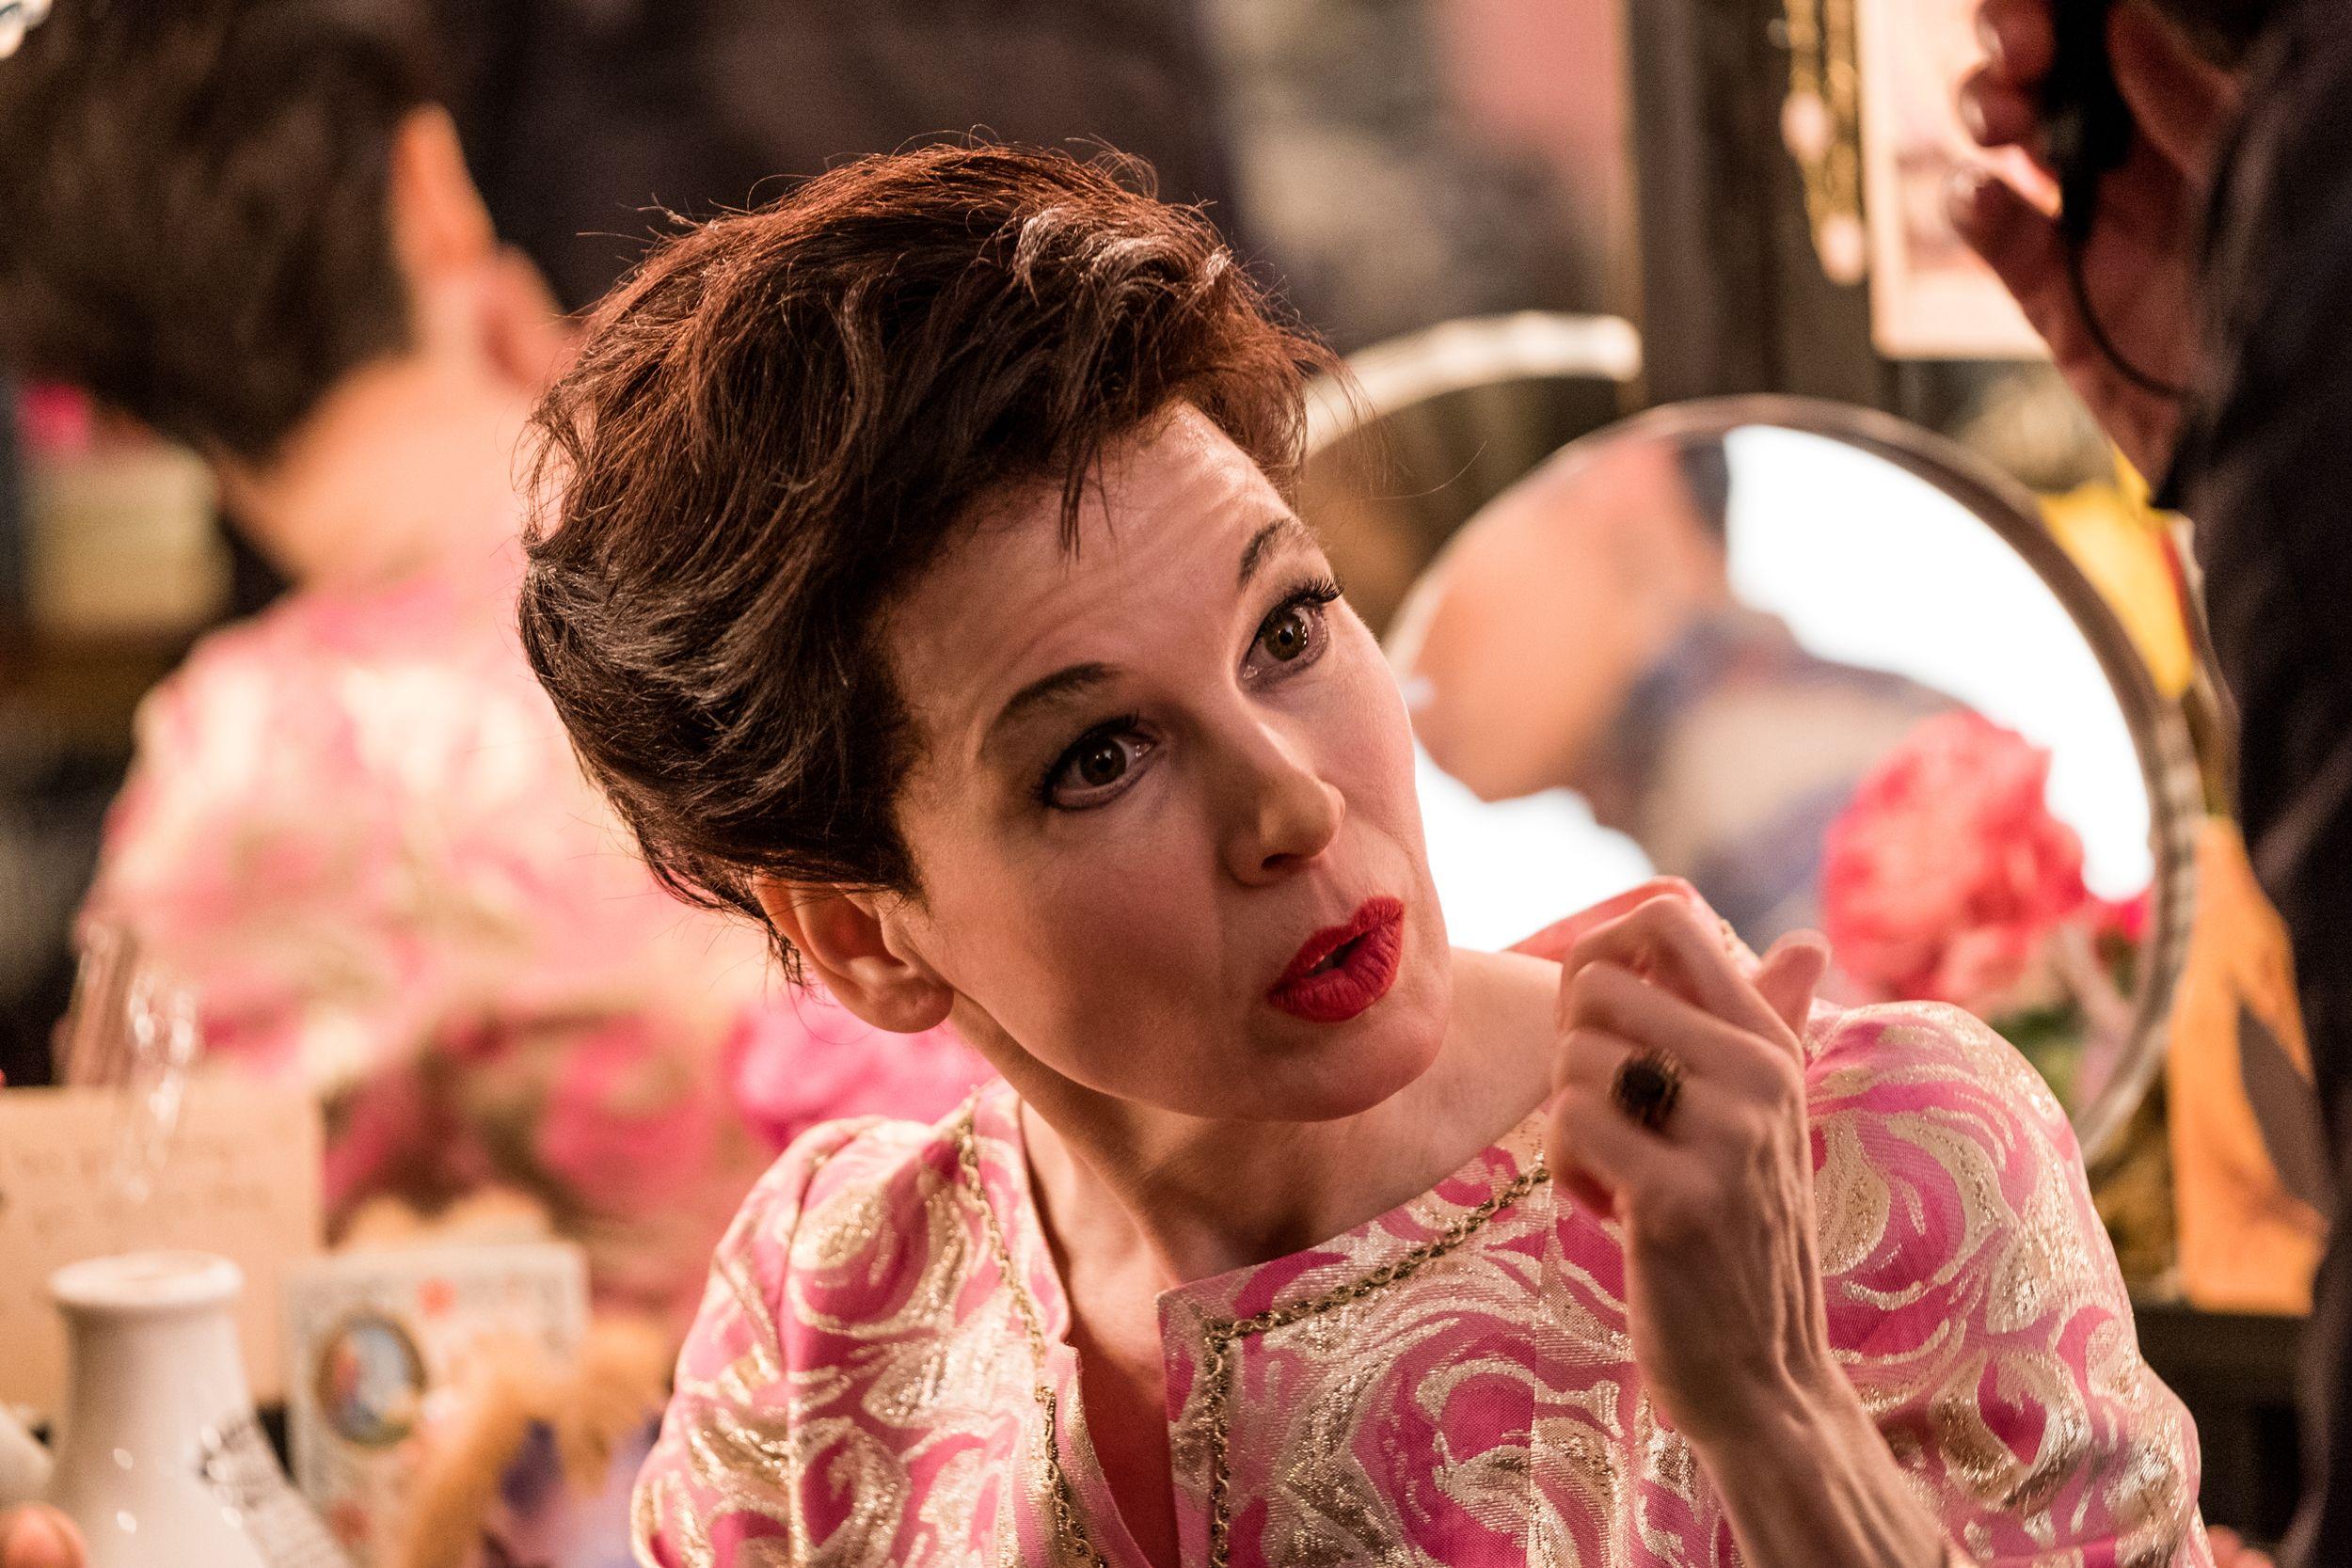 Renée Zellweger as Judy Garland in the upcoming film JUDY .